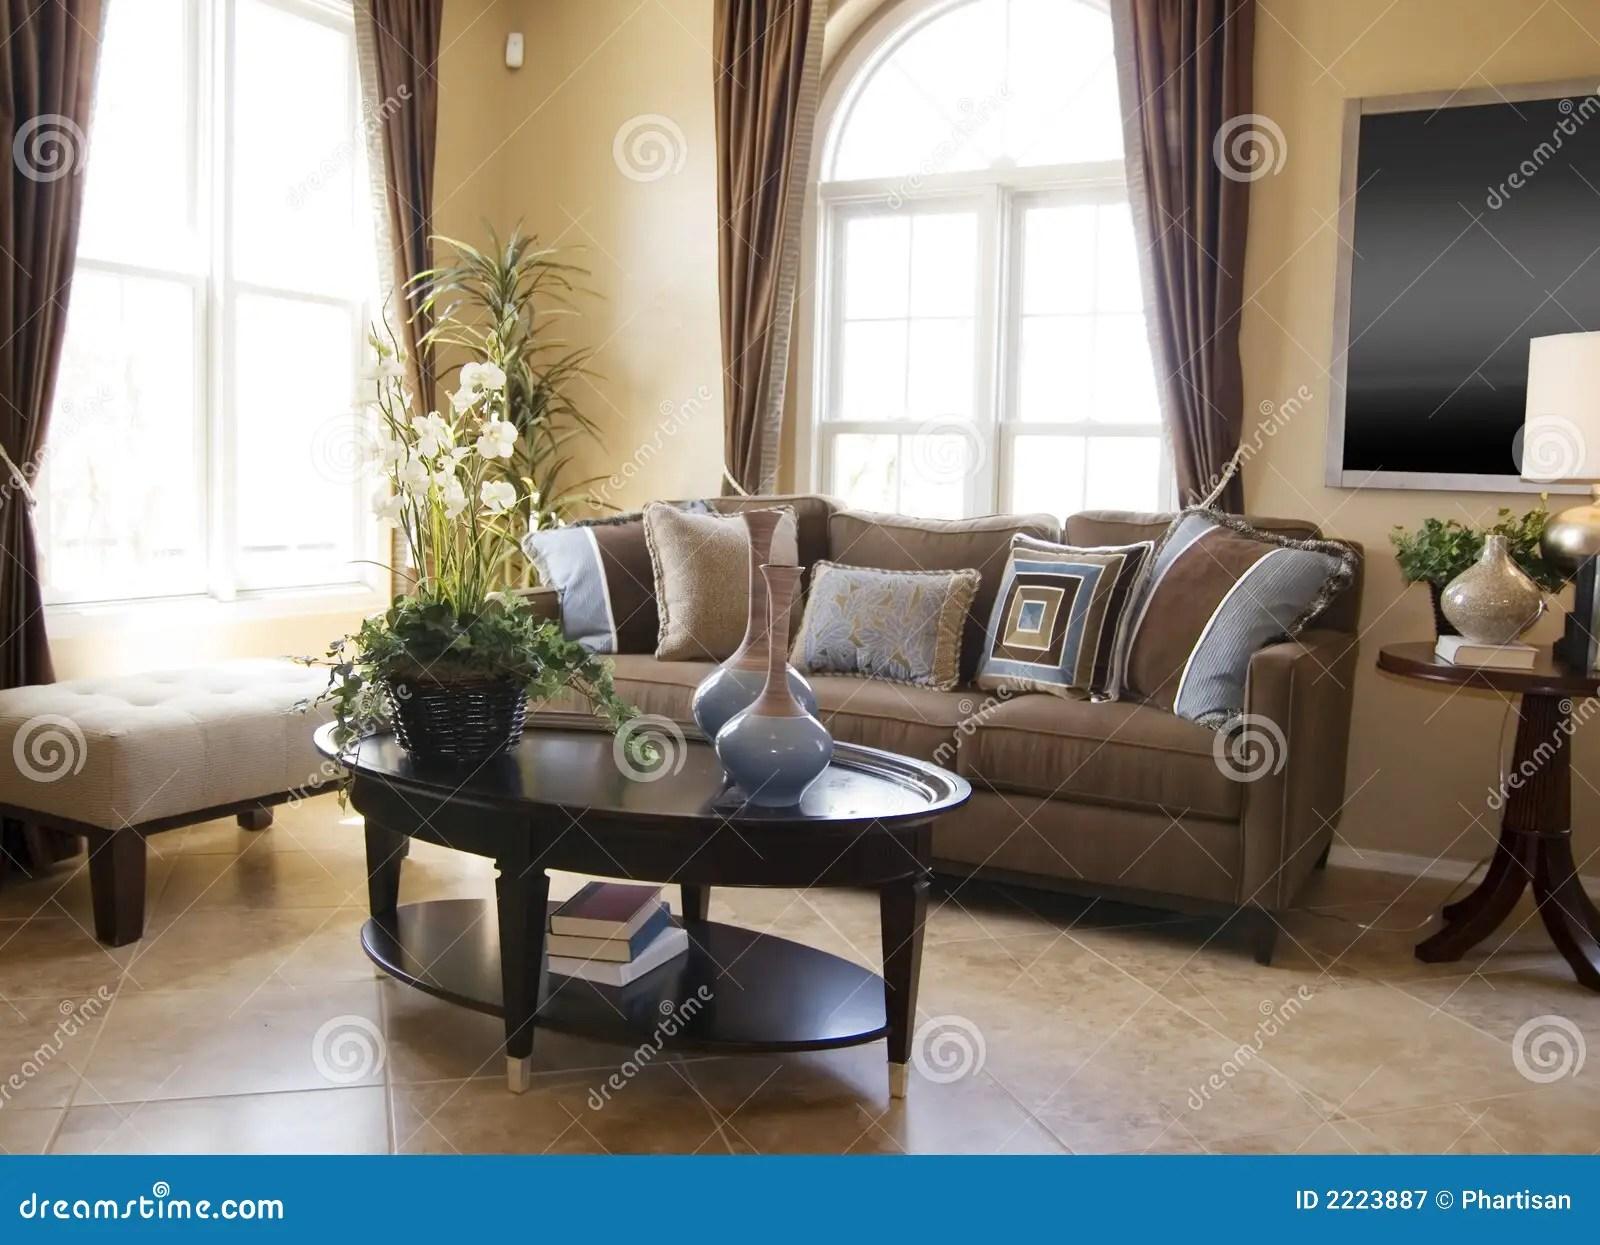 Beautiful Modern Interor Decor Royalty Free Stock Photography  Image 2223887